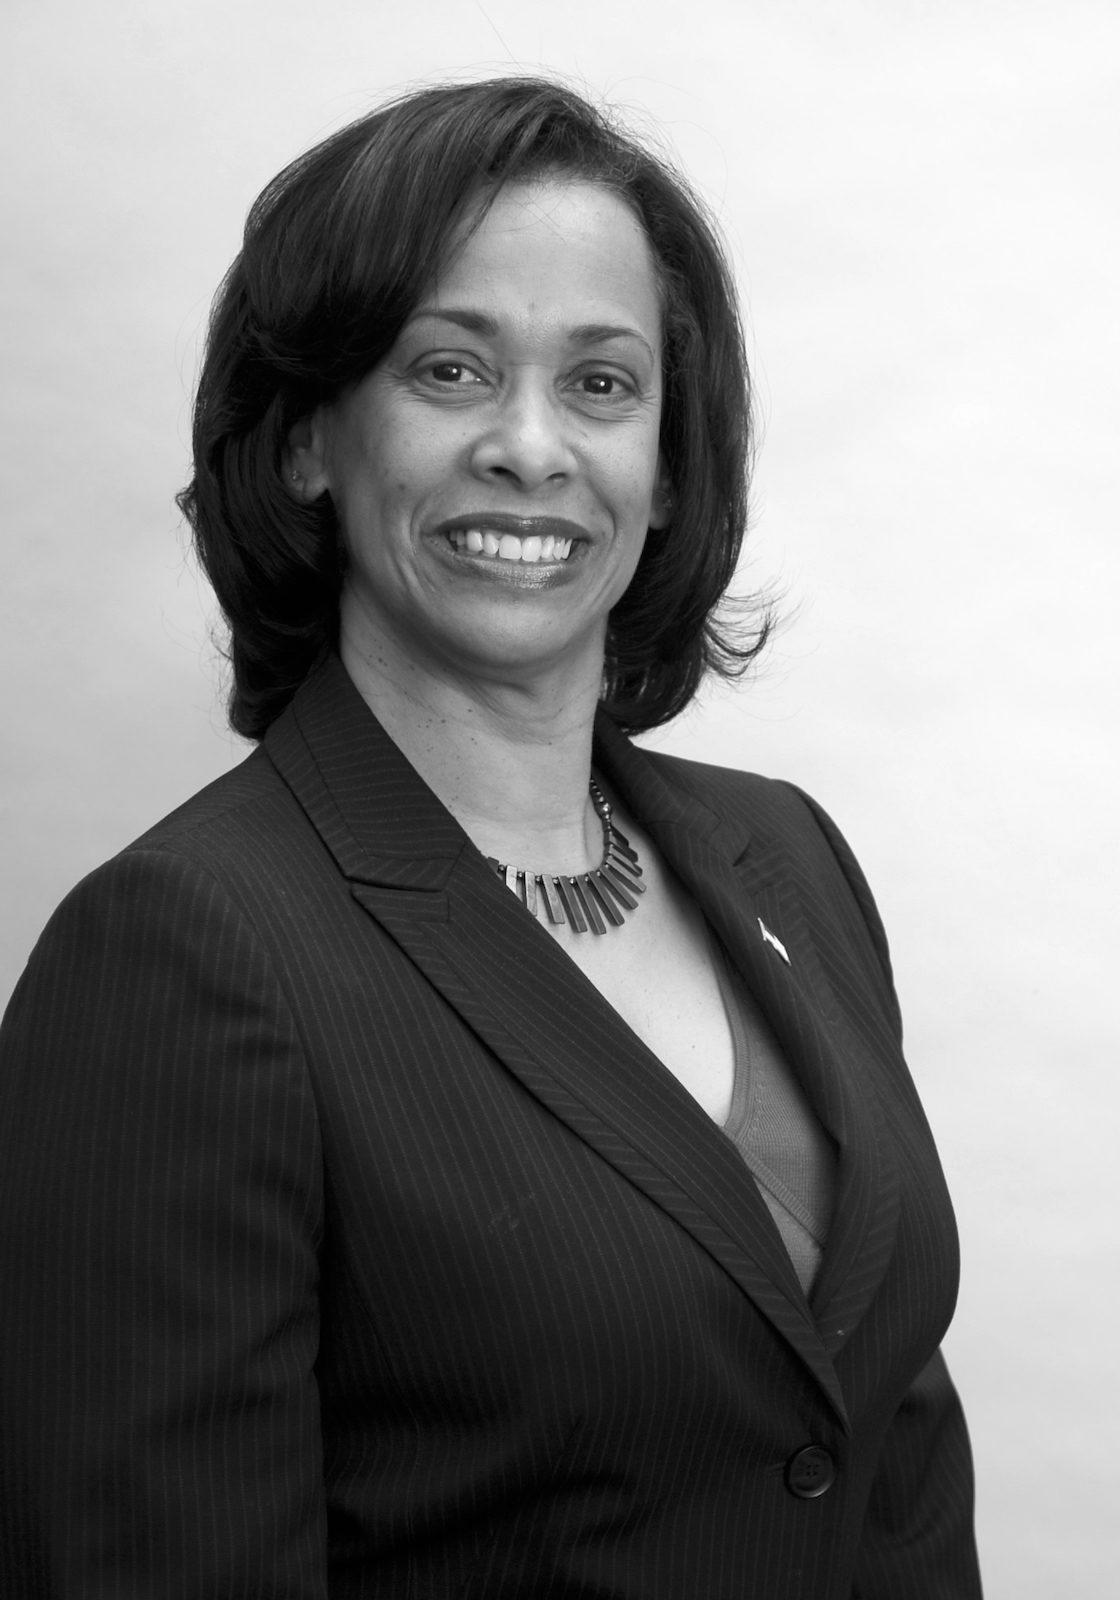 Toni E. Walker, Willoughby Avenue, The Five Fifths, KOLUMN Magazine, KOLUMN, African American Politics, Black in Politics